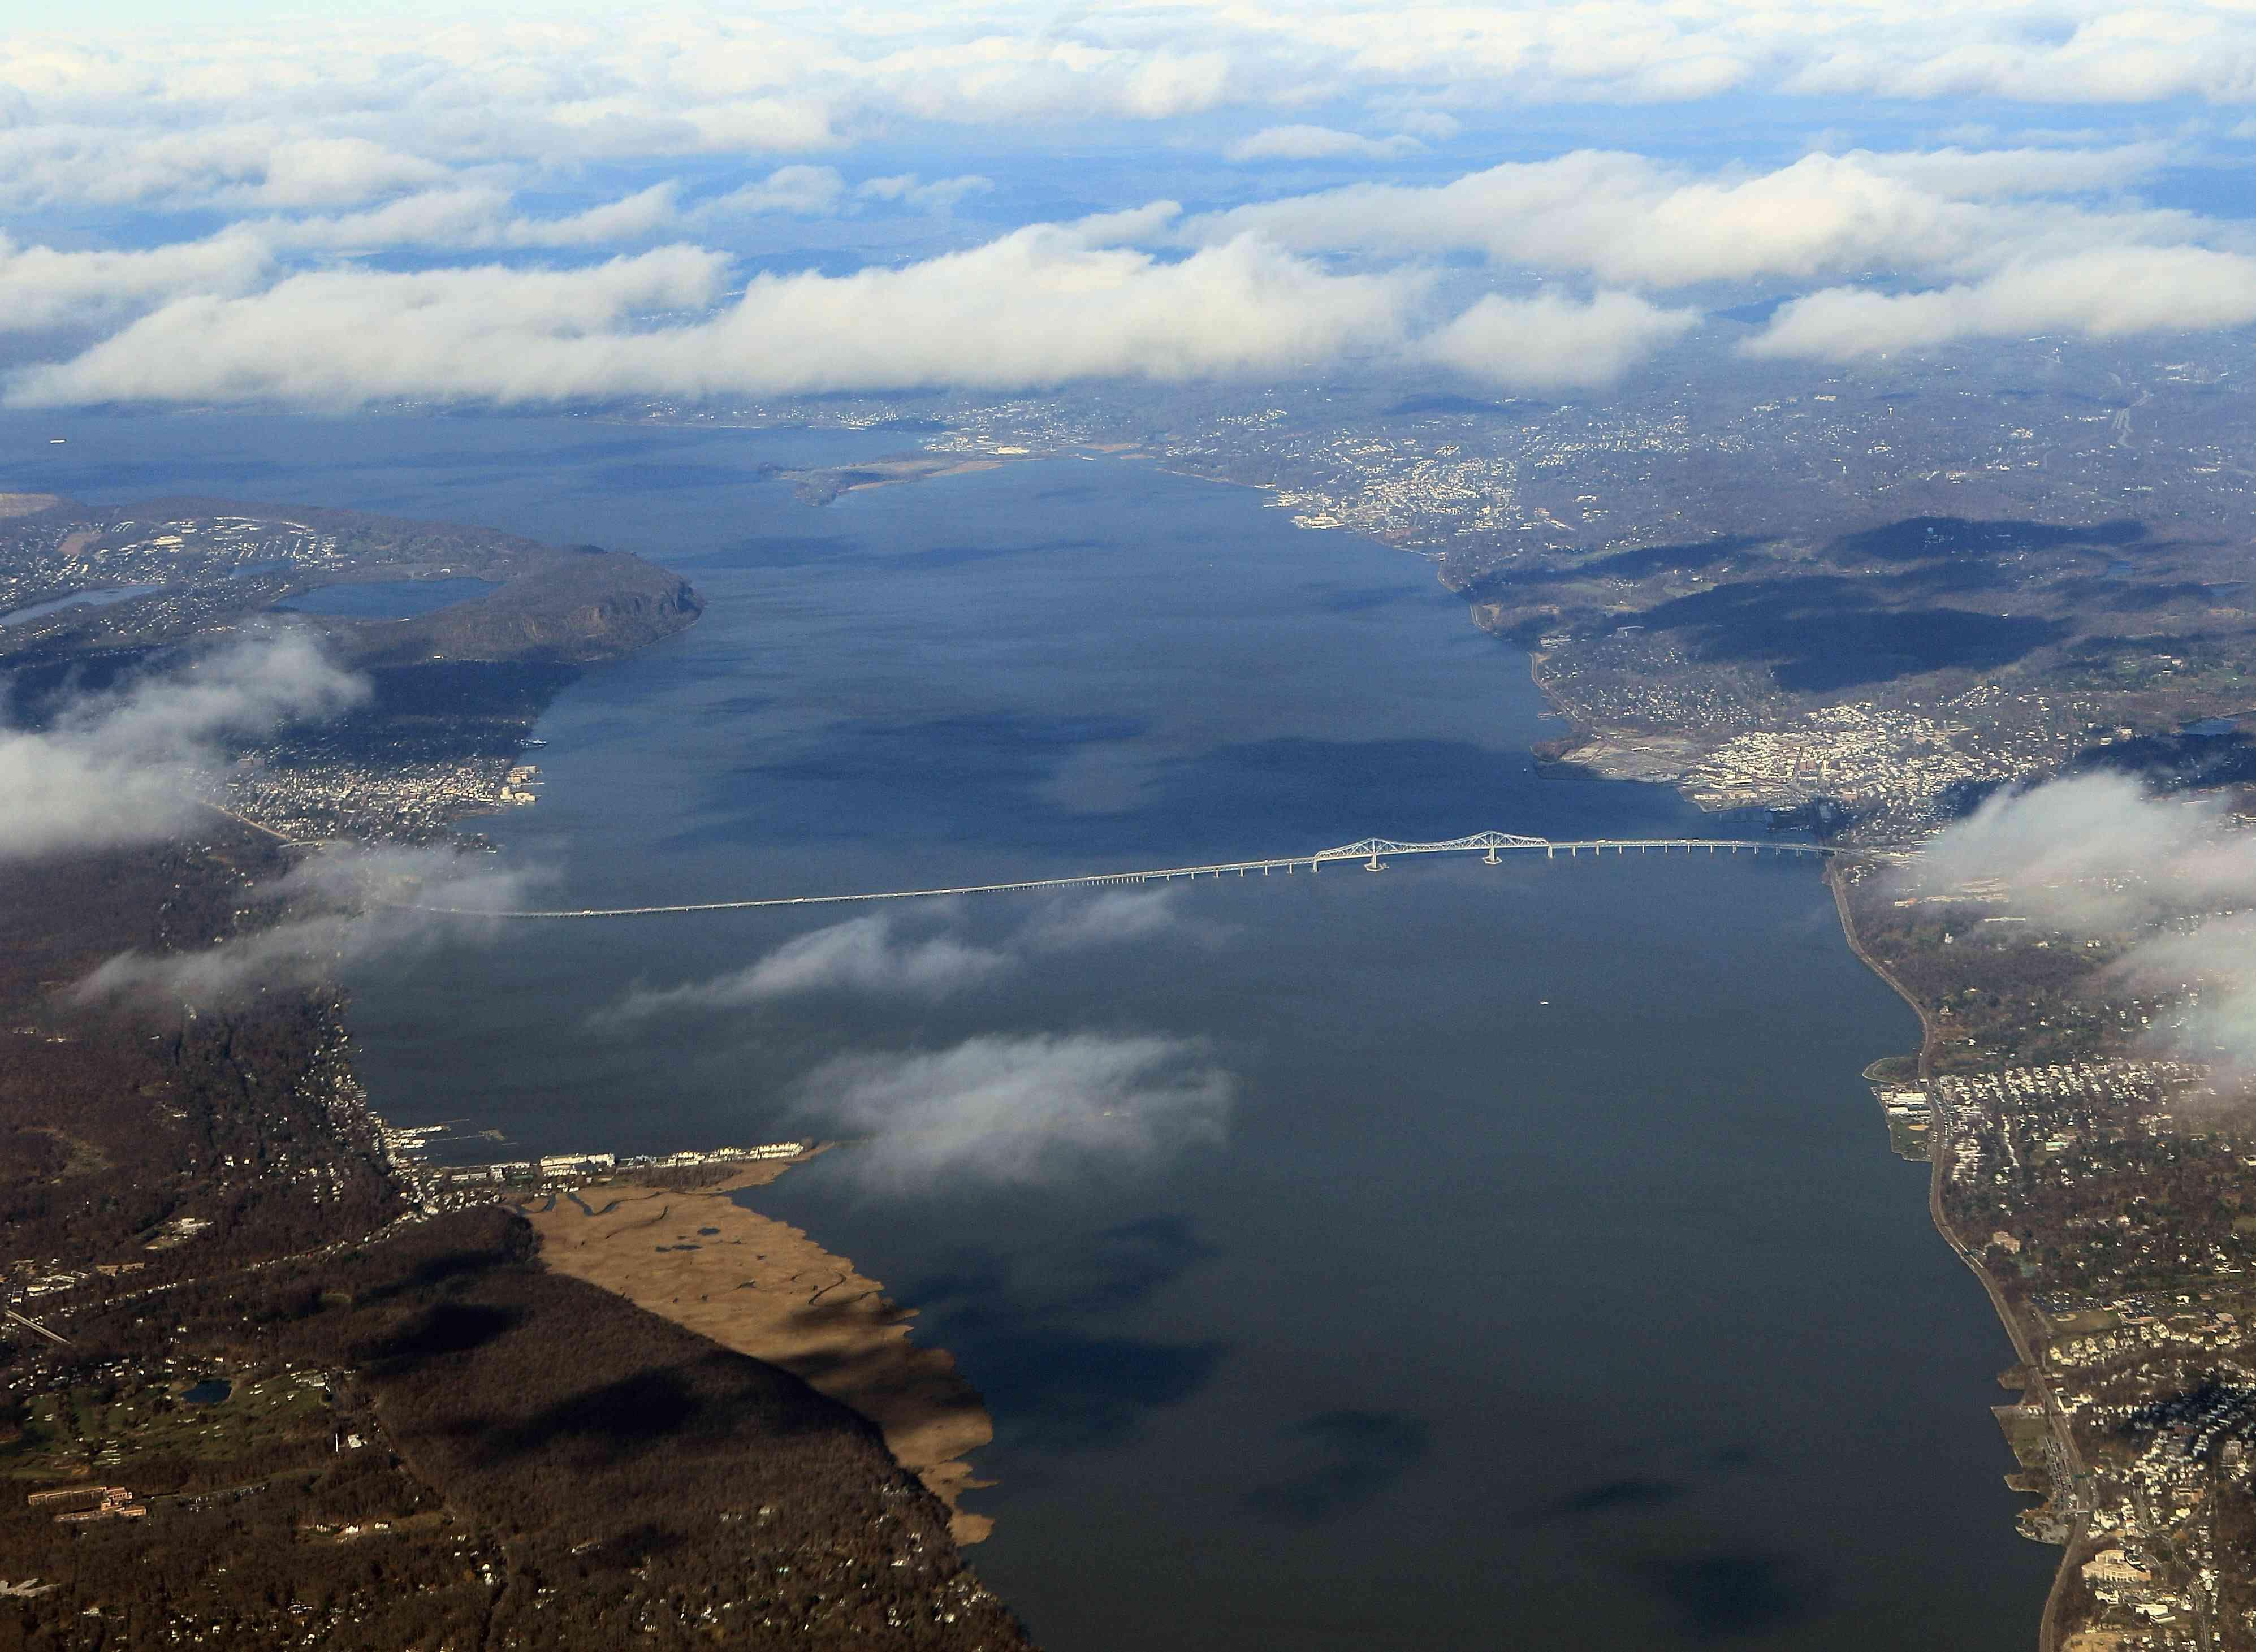 Aerial view of Tappan Zee Bridge, New York